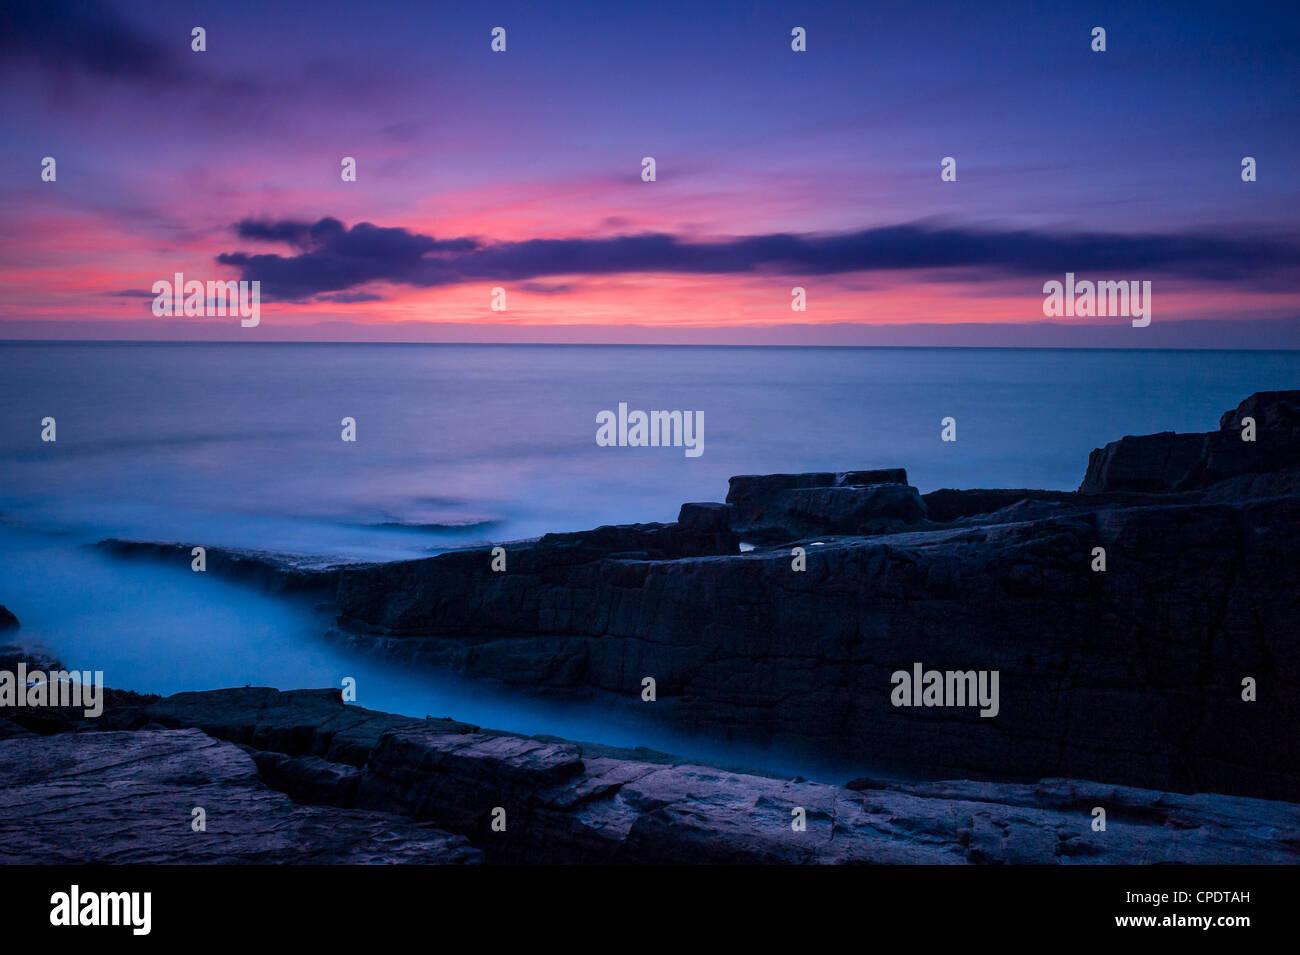 Looking out towards Isle of Lewis from Stoer Lighthouse at dusk, Highlands, Scotland, UK Stock Photo